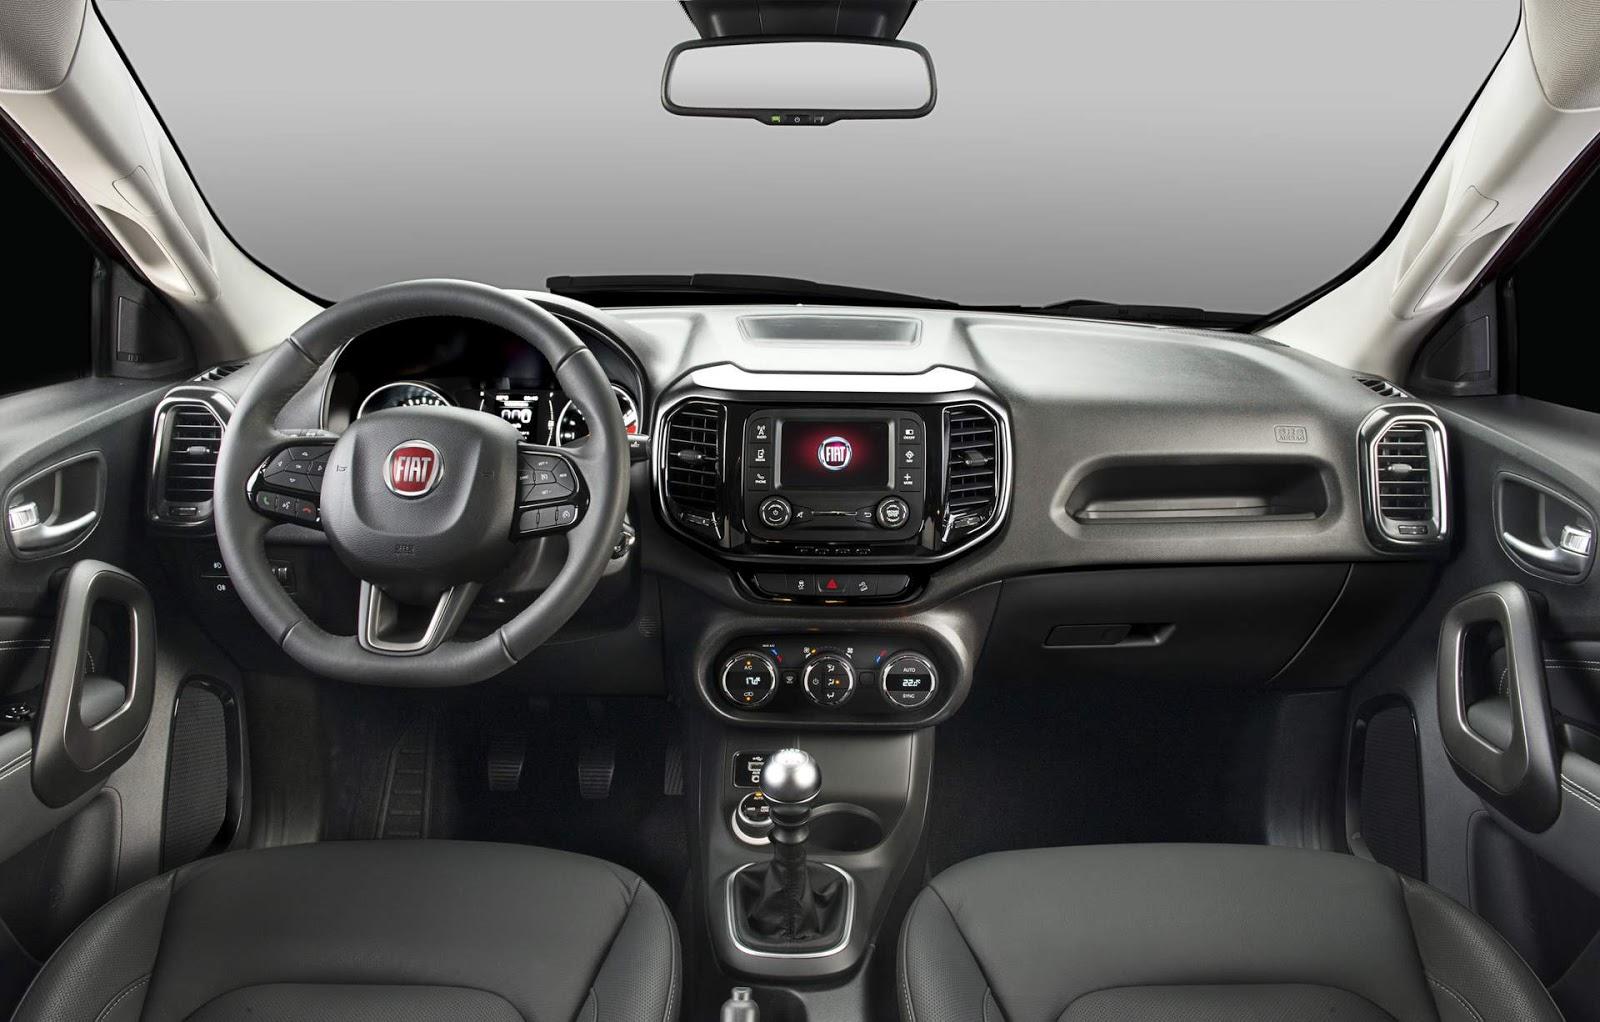 Sobre Fiat Toro Fiat-Toro-flex-manual%2B%25281%2529